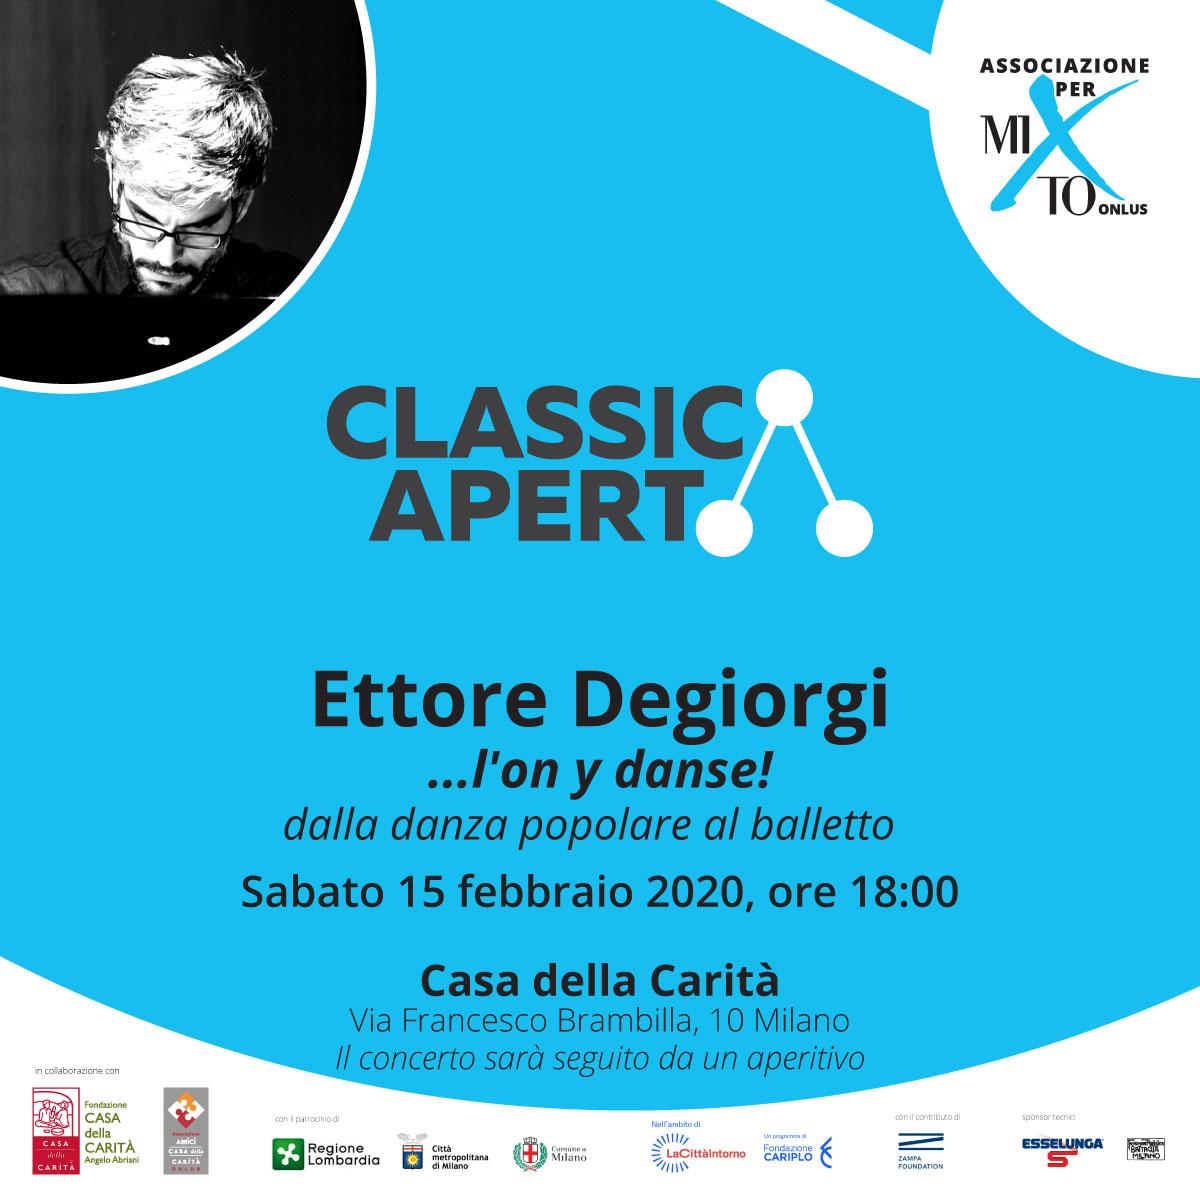 ClassicaAperta torna a Bookcity con Luca Ciammarughi